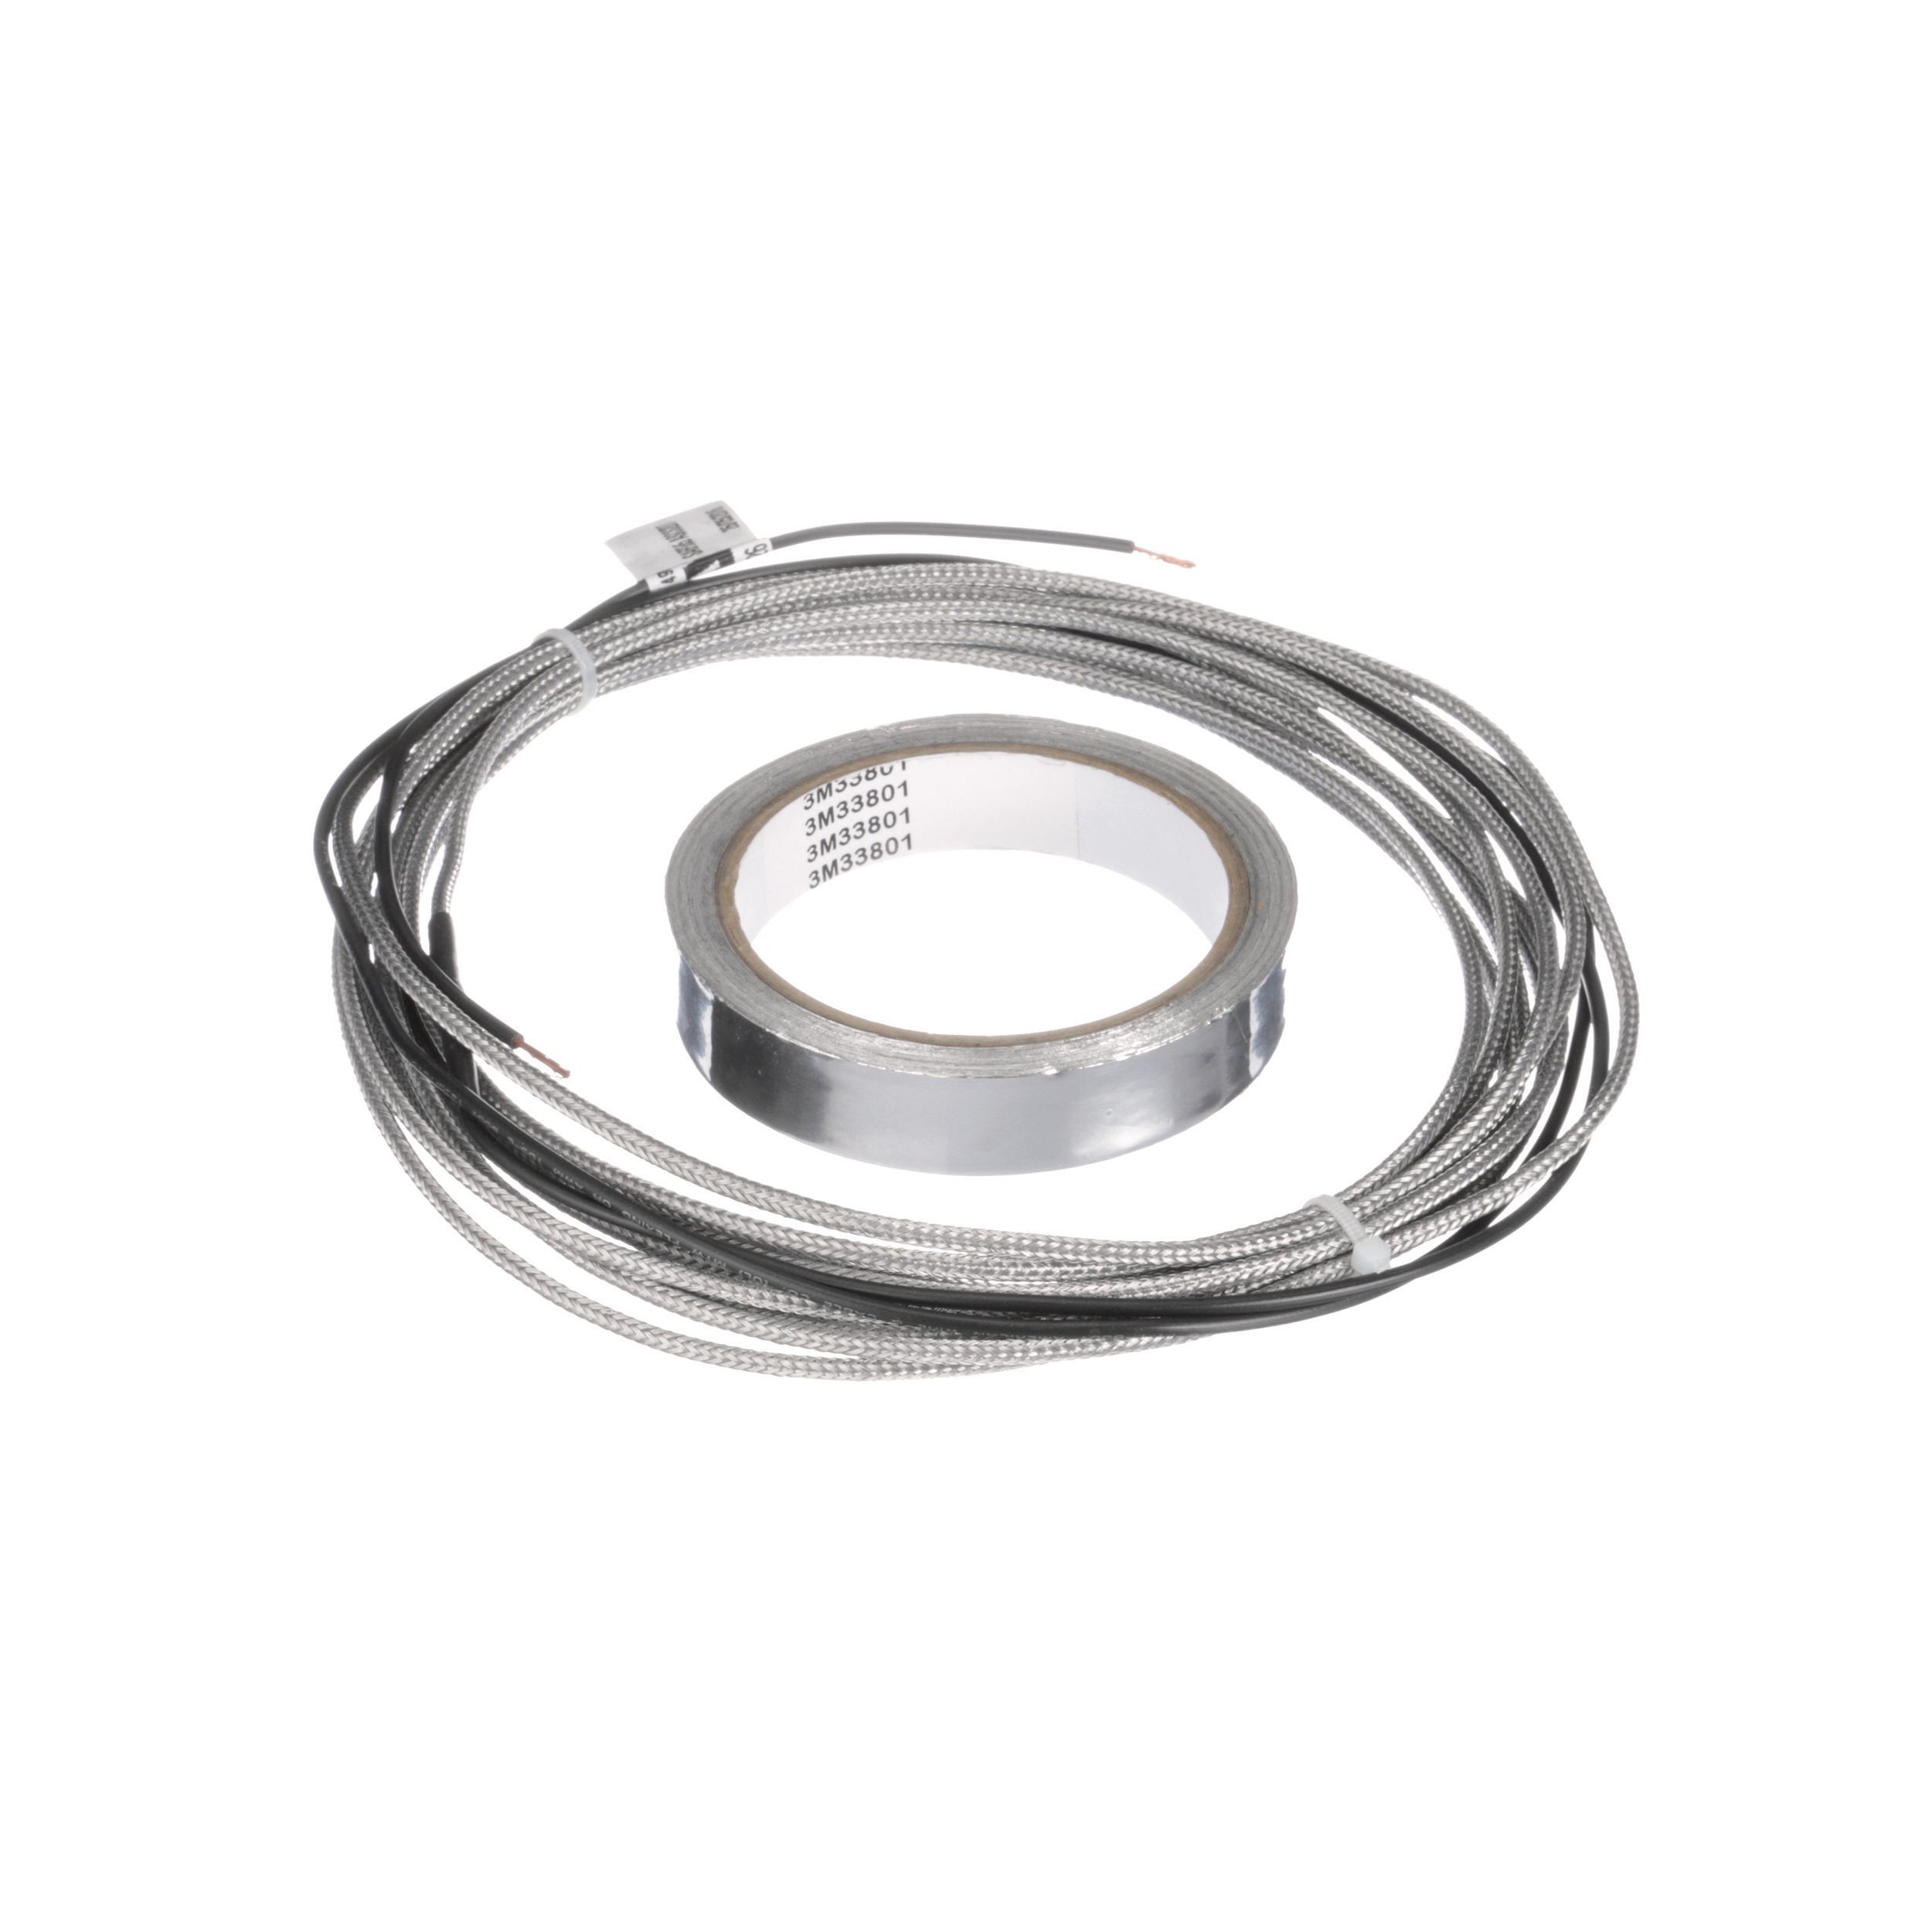 KOLPAK HEATERWIRE SVC/INSTALL KIT FOR 500000178